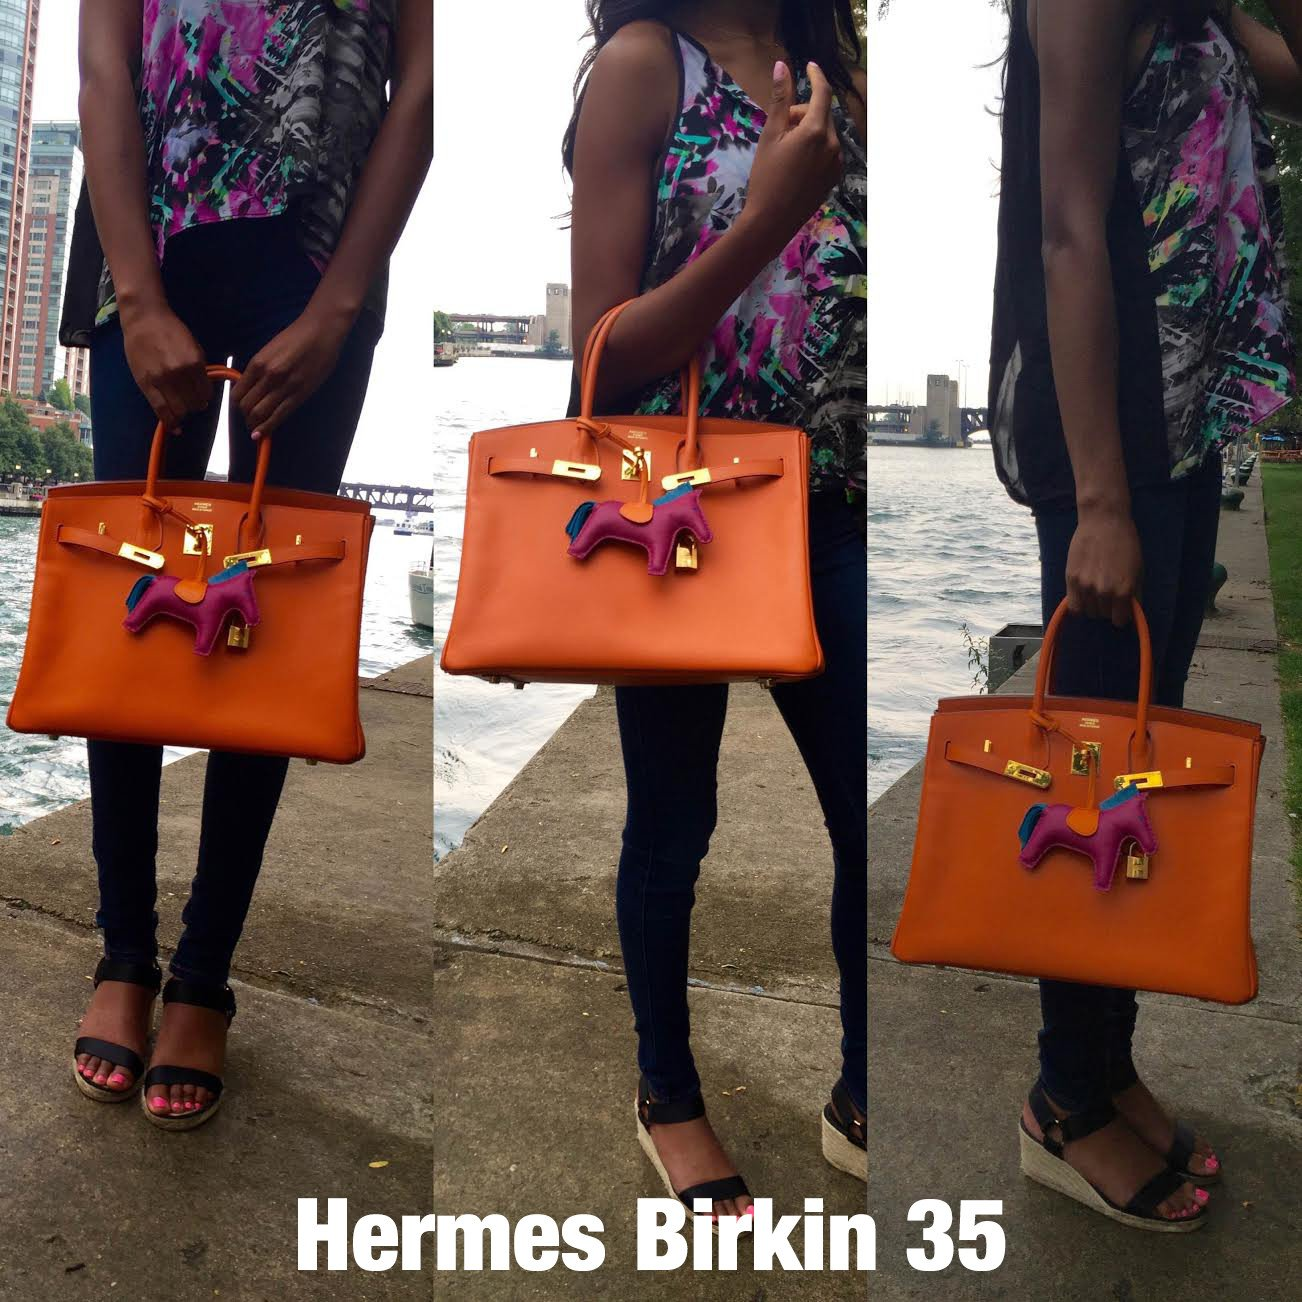 6fab2cbecb1a Hermes Birkin Size Comparison - PurseBop